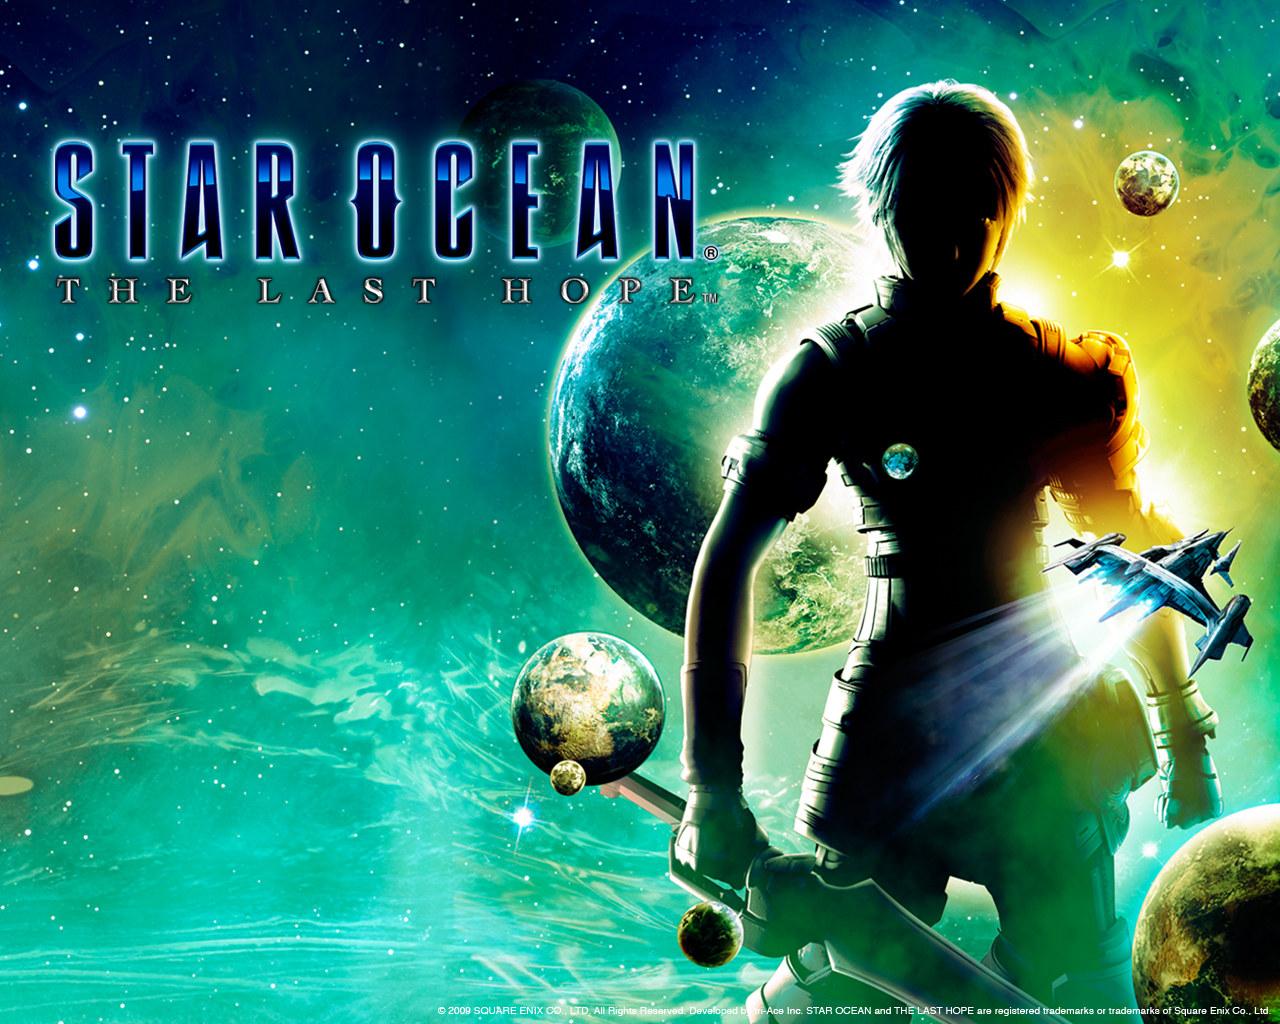 http://3.bp.blogspot.com/-TETYLgtQYnM/Tbd2C-vRlBI/AAAAAAAAADo/RCzGNICvxFY/s1600/star_ocean__the_last_hope_wall_1.jpg